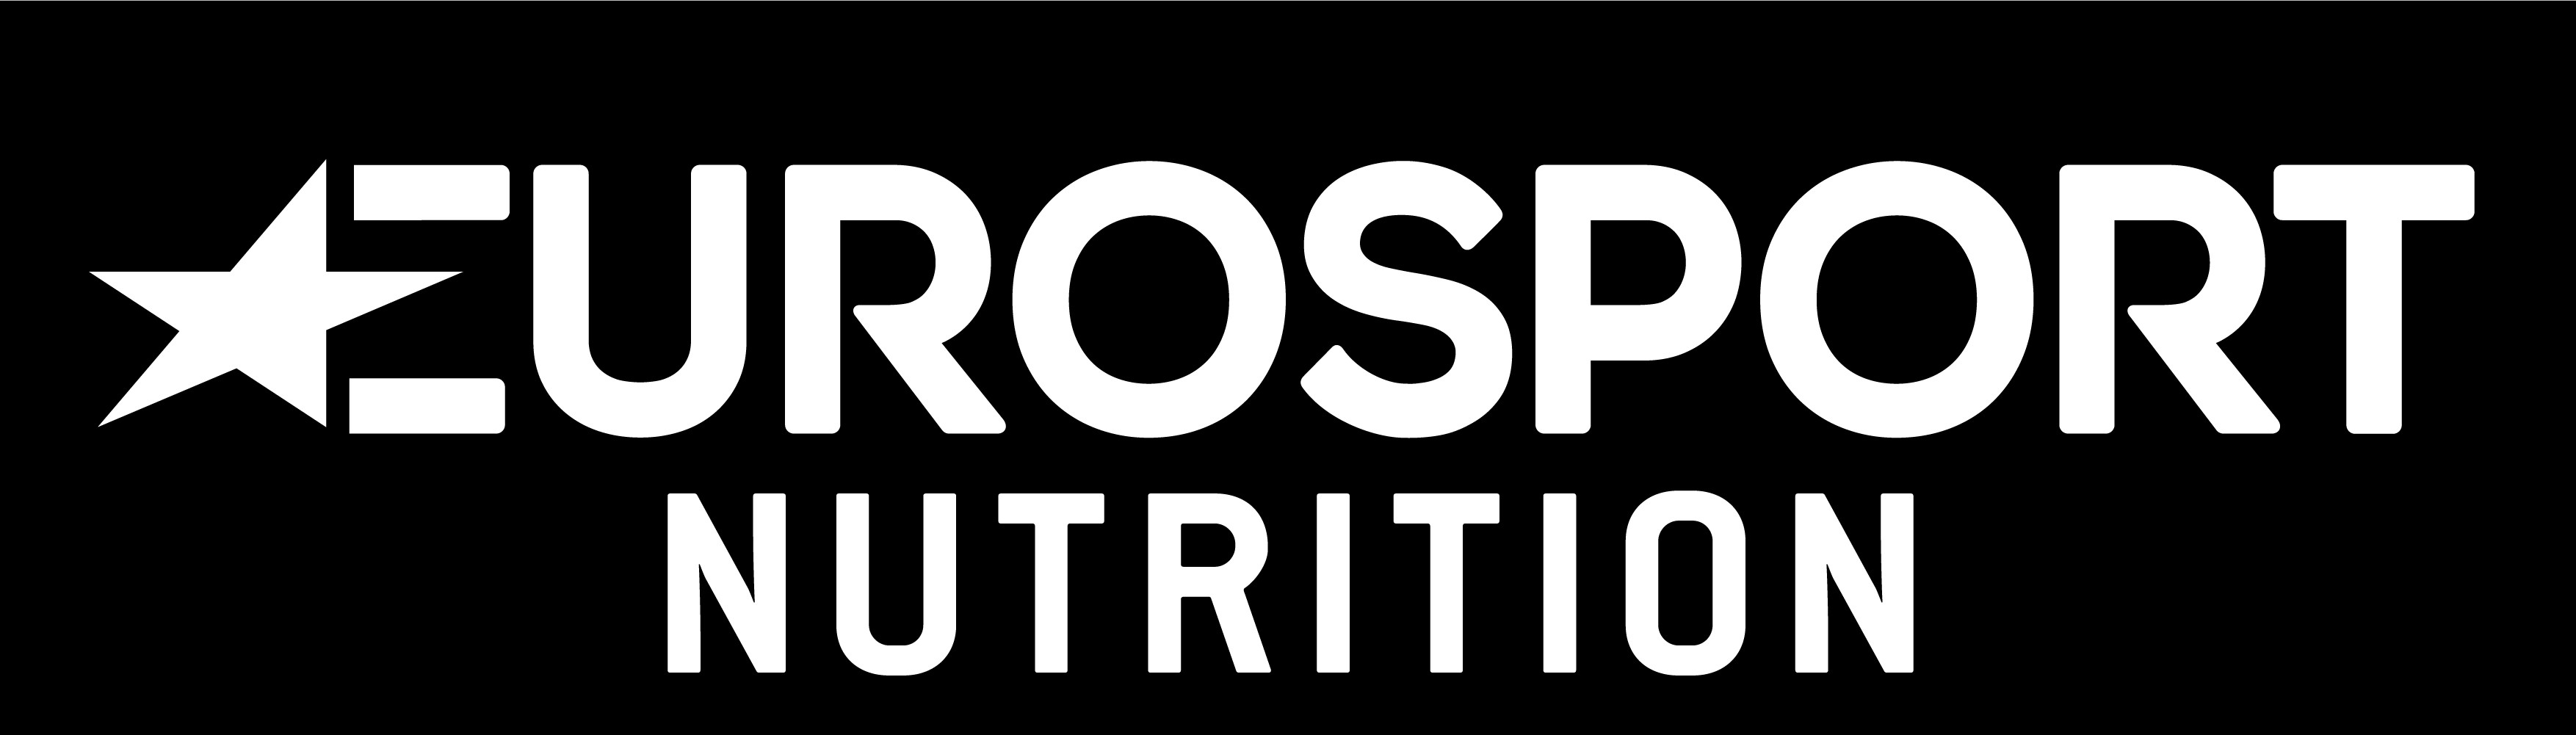 Nieuw: Eurosport Nutrition